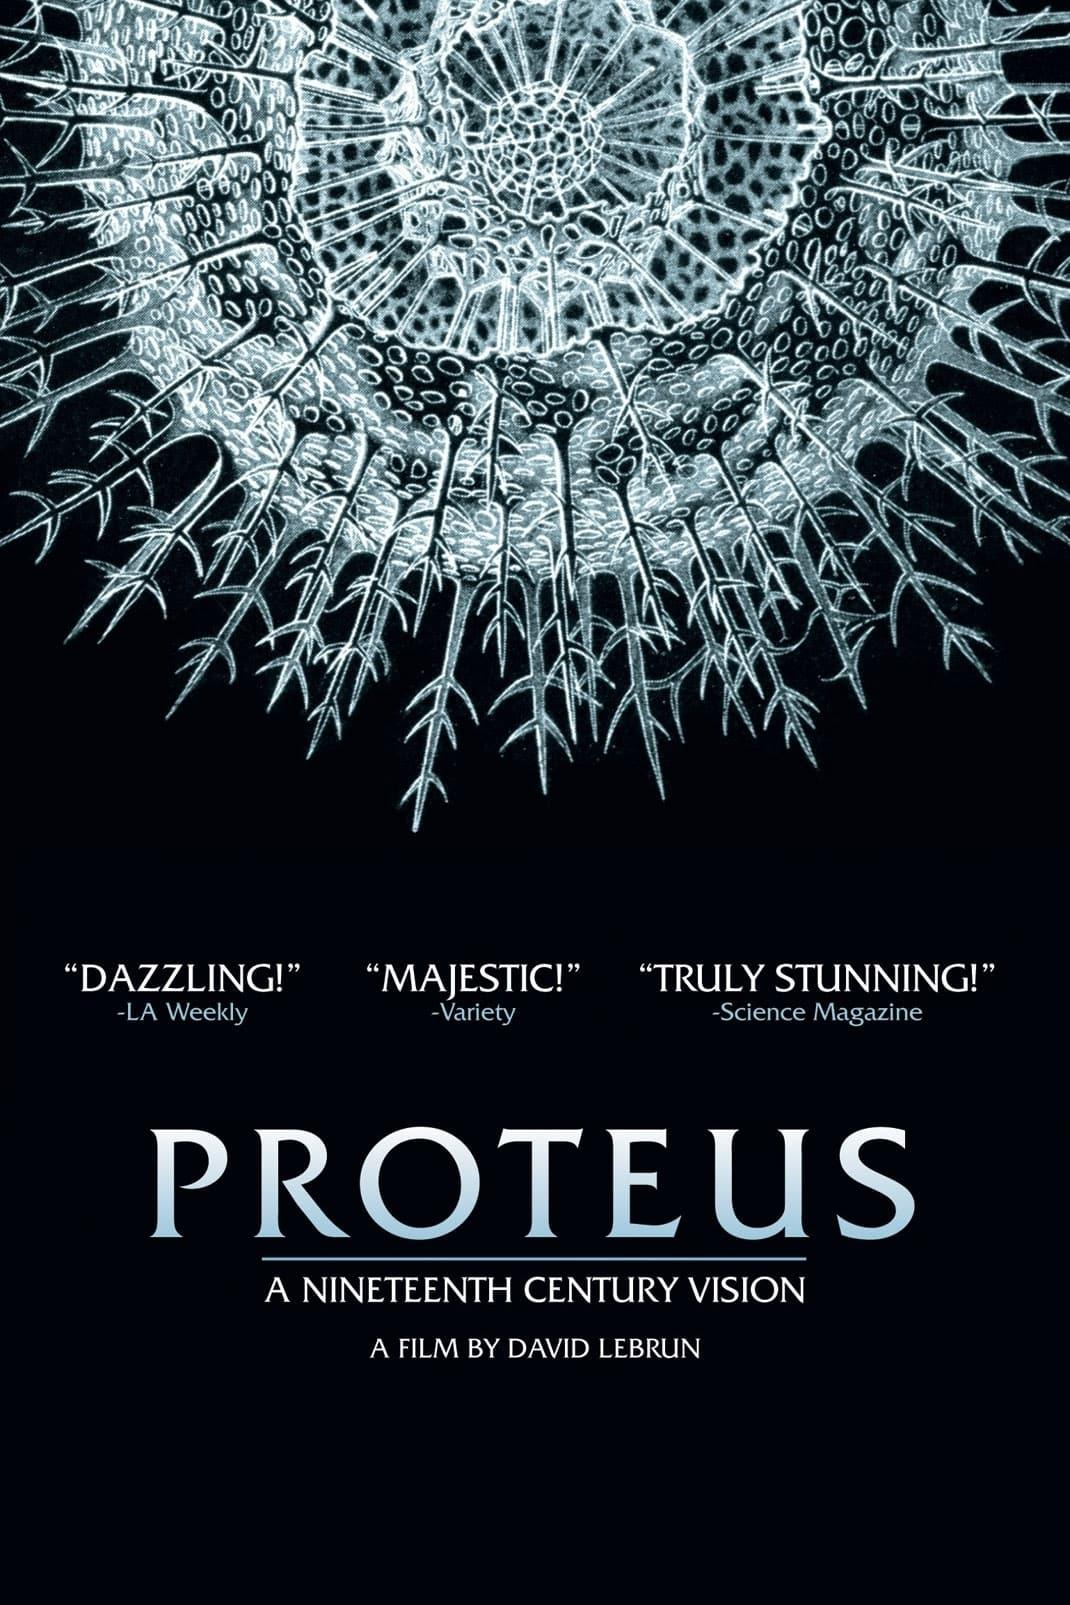 Proteus: A Nineteenth Century Vision